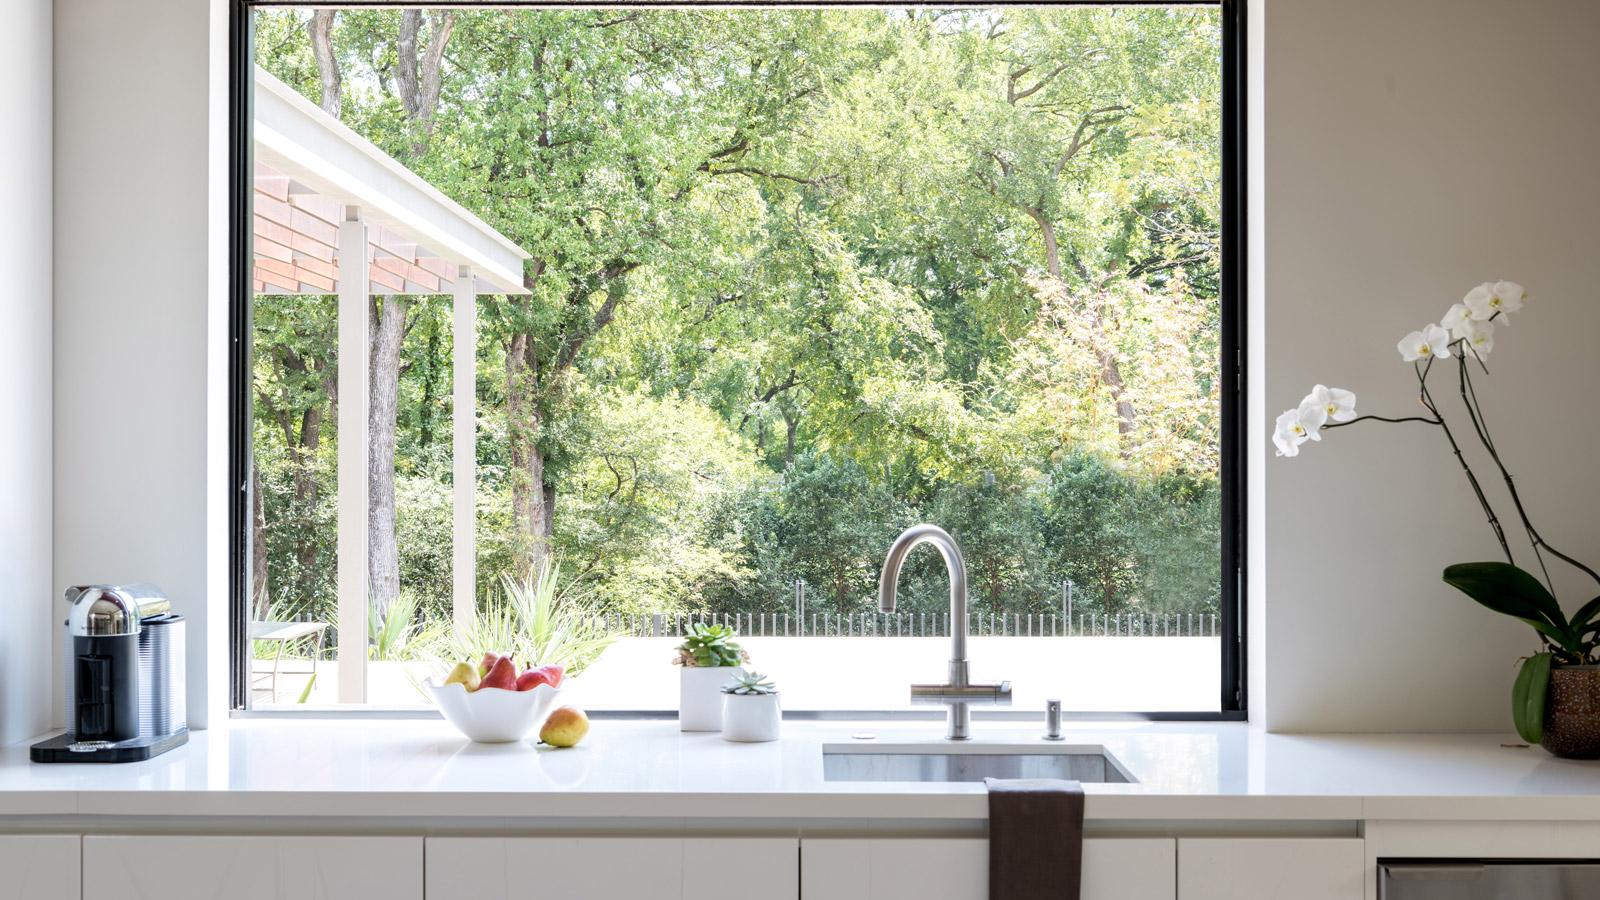 A Beautifully Simple Kitchen: Design by Elizabeth Lewis Schramme & Josh Delafuente | Photo by Michael Hunter